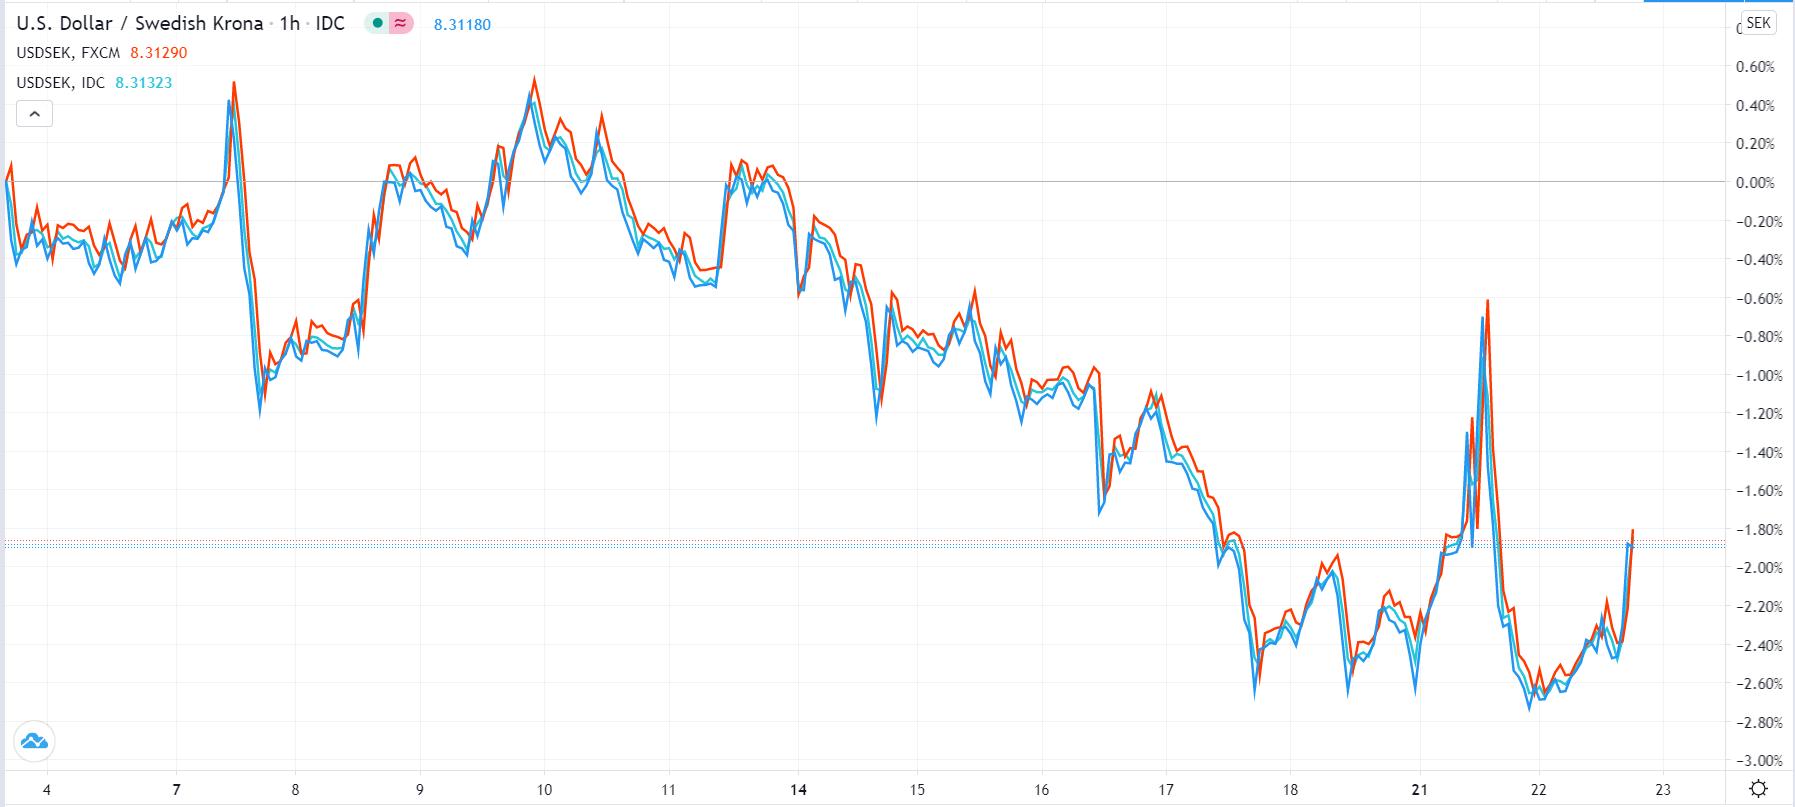 USD/SEK line chart